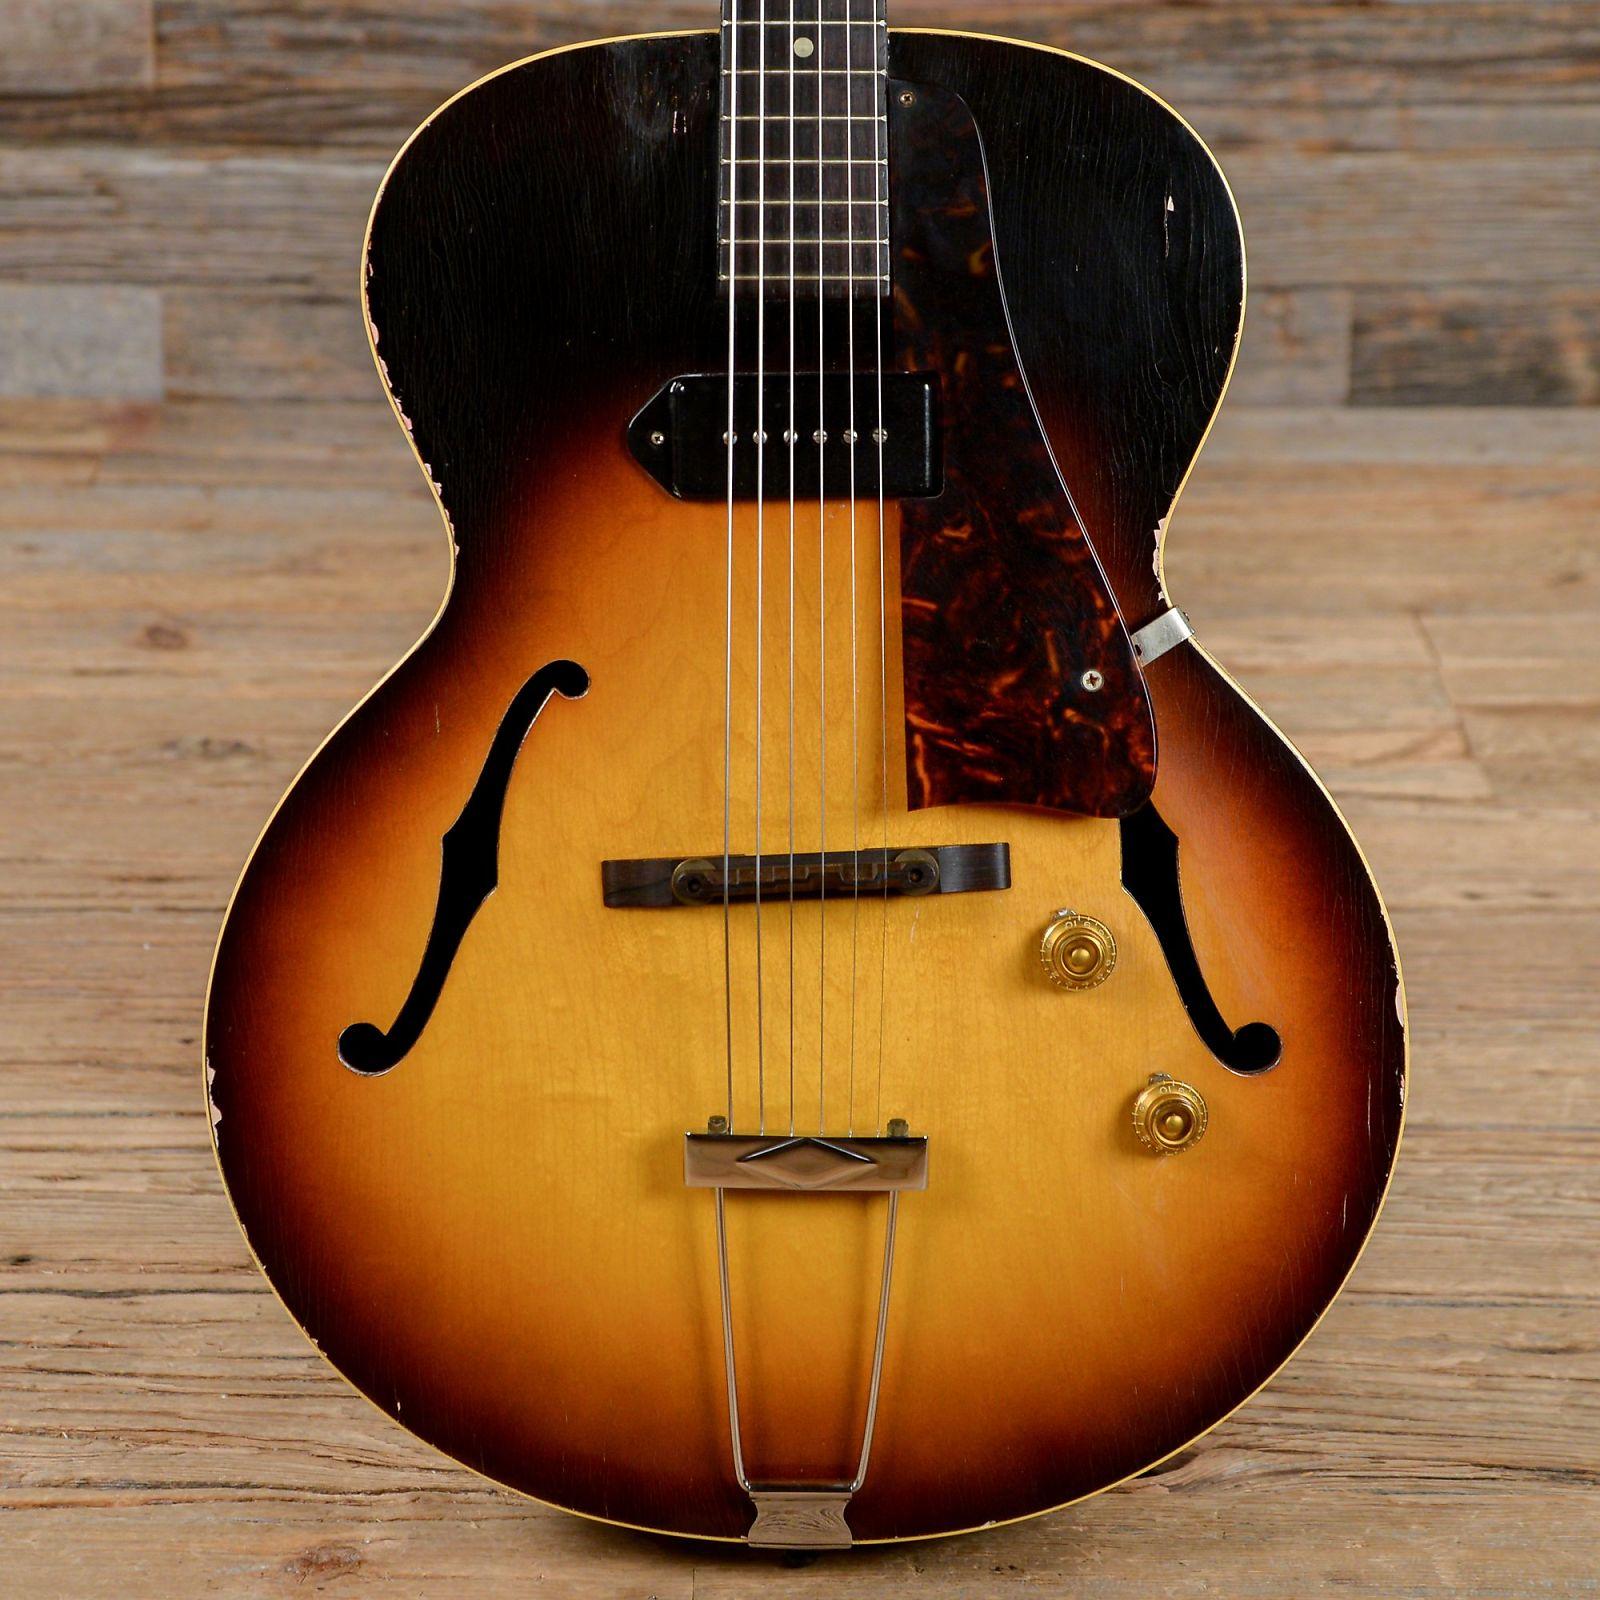 Gibson ES-125 Sunburst 1958 on gibson l-30, gibson eds-1275, gibson l-5, gibson cs-336, gibson es-300, gibson sonex, gibson es-325, gibson 125 guitar, gibson es-lp, gibson es-165, gibson 335 guitar, gibson es-135, gibson es-150, gibson es-5, gibson es-137, gibson 175 guitar, gibson citation, gibson st 125, gibson es-335,